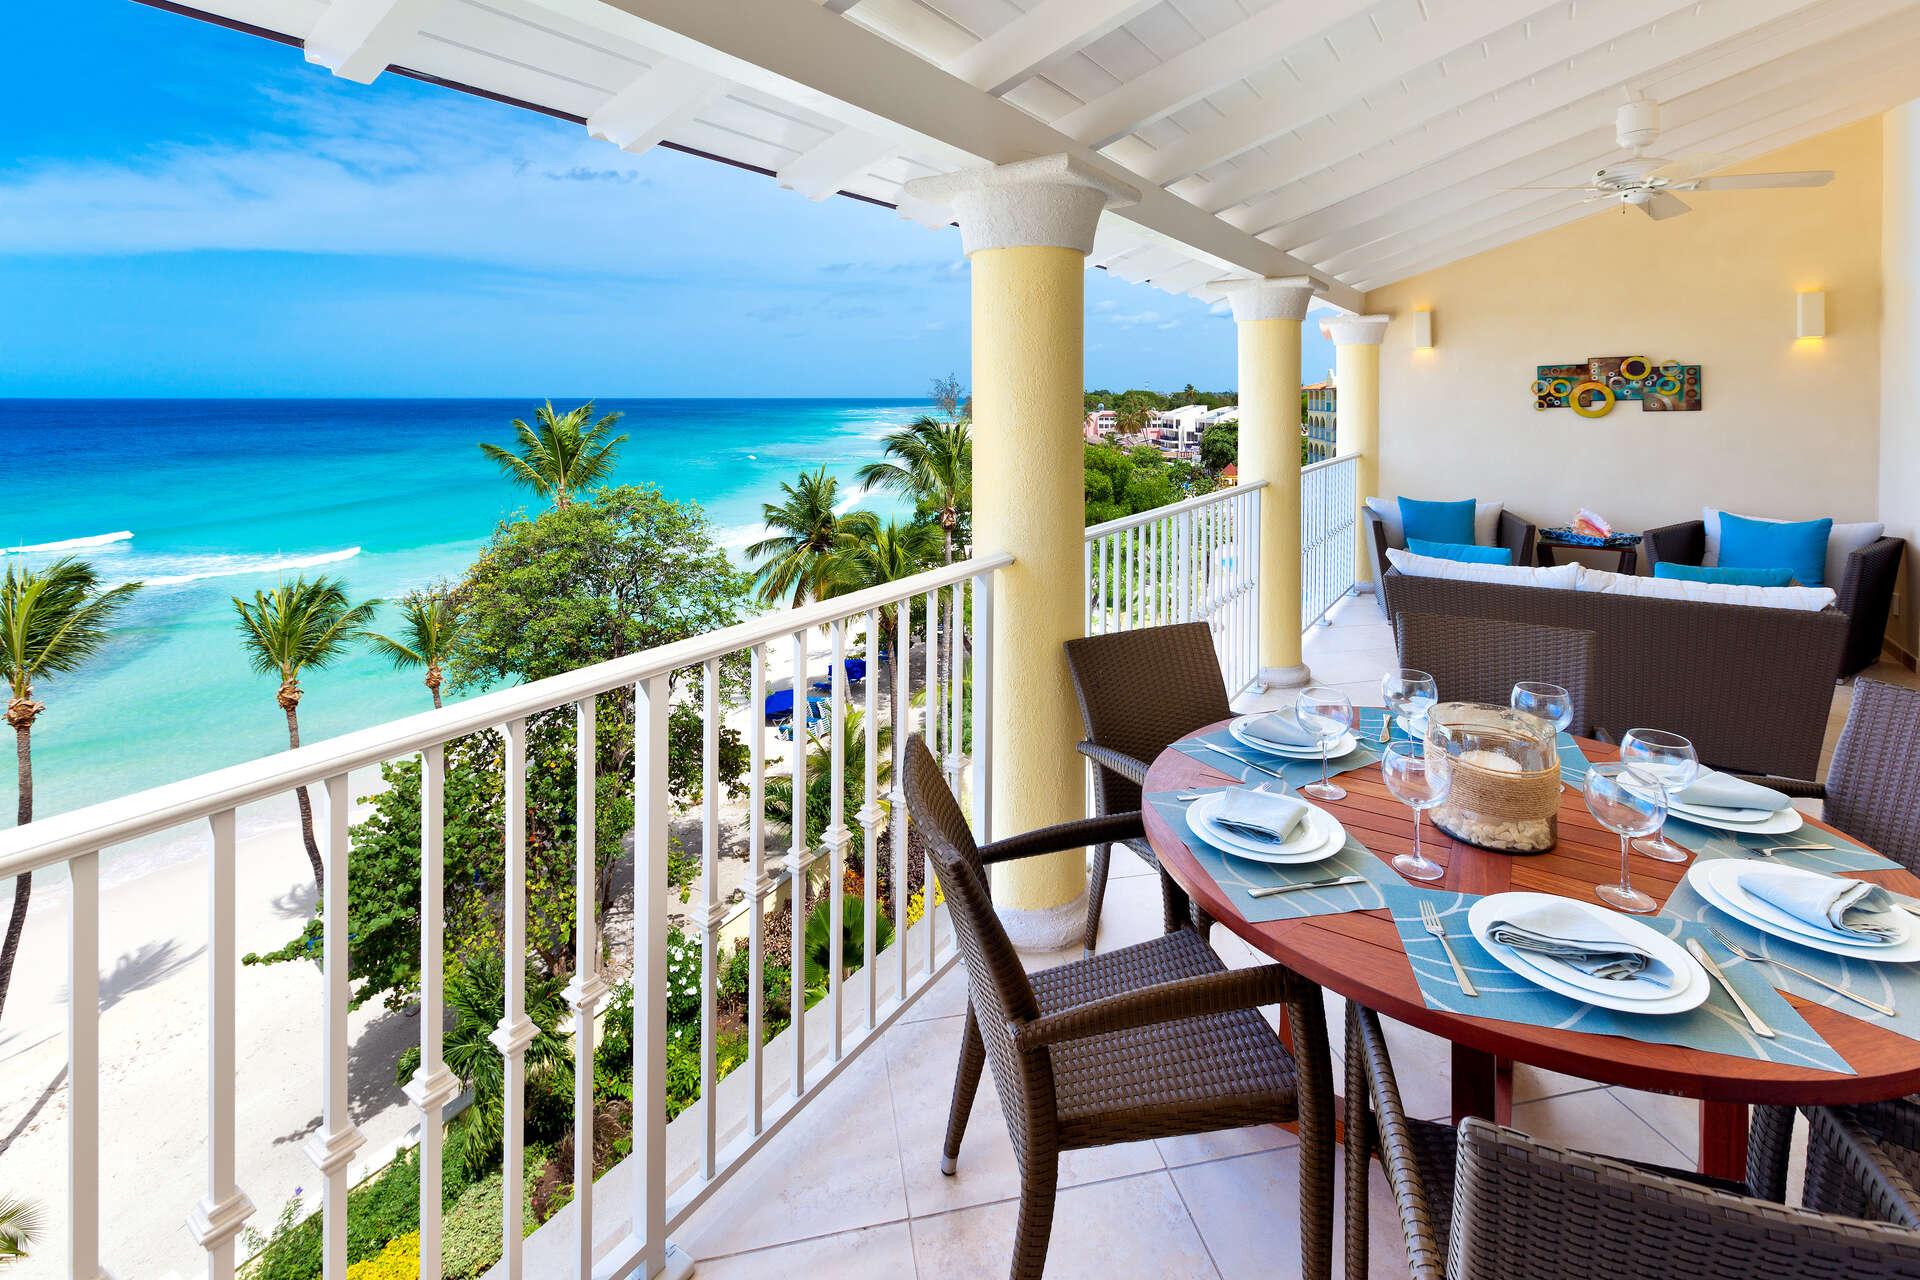 Luxury villa rentals caribbean - Barbados - Christ church - Oistins  - Sapphire Beach 517 - Image 1/12